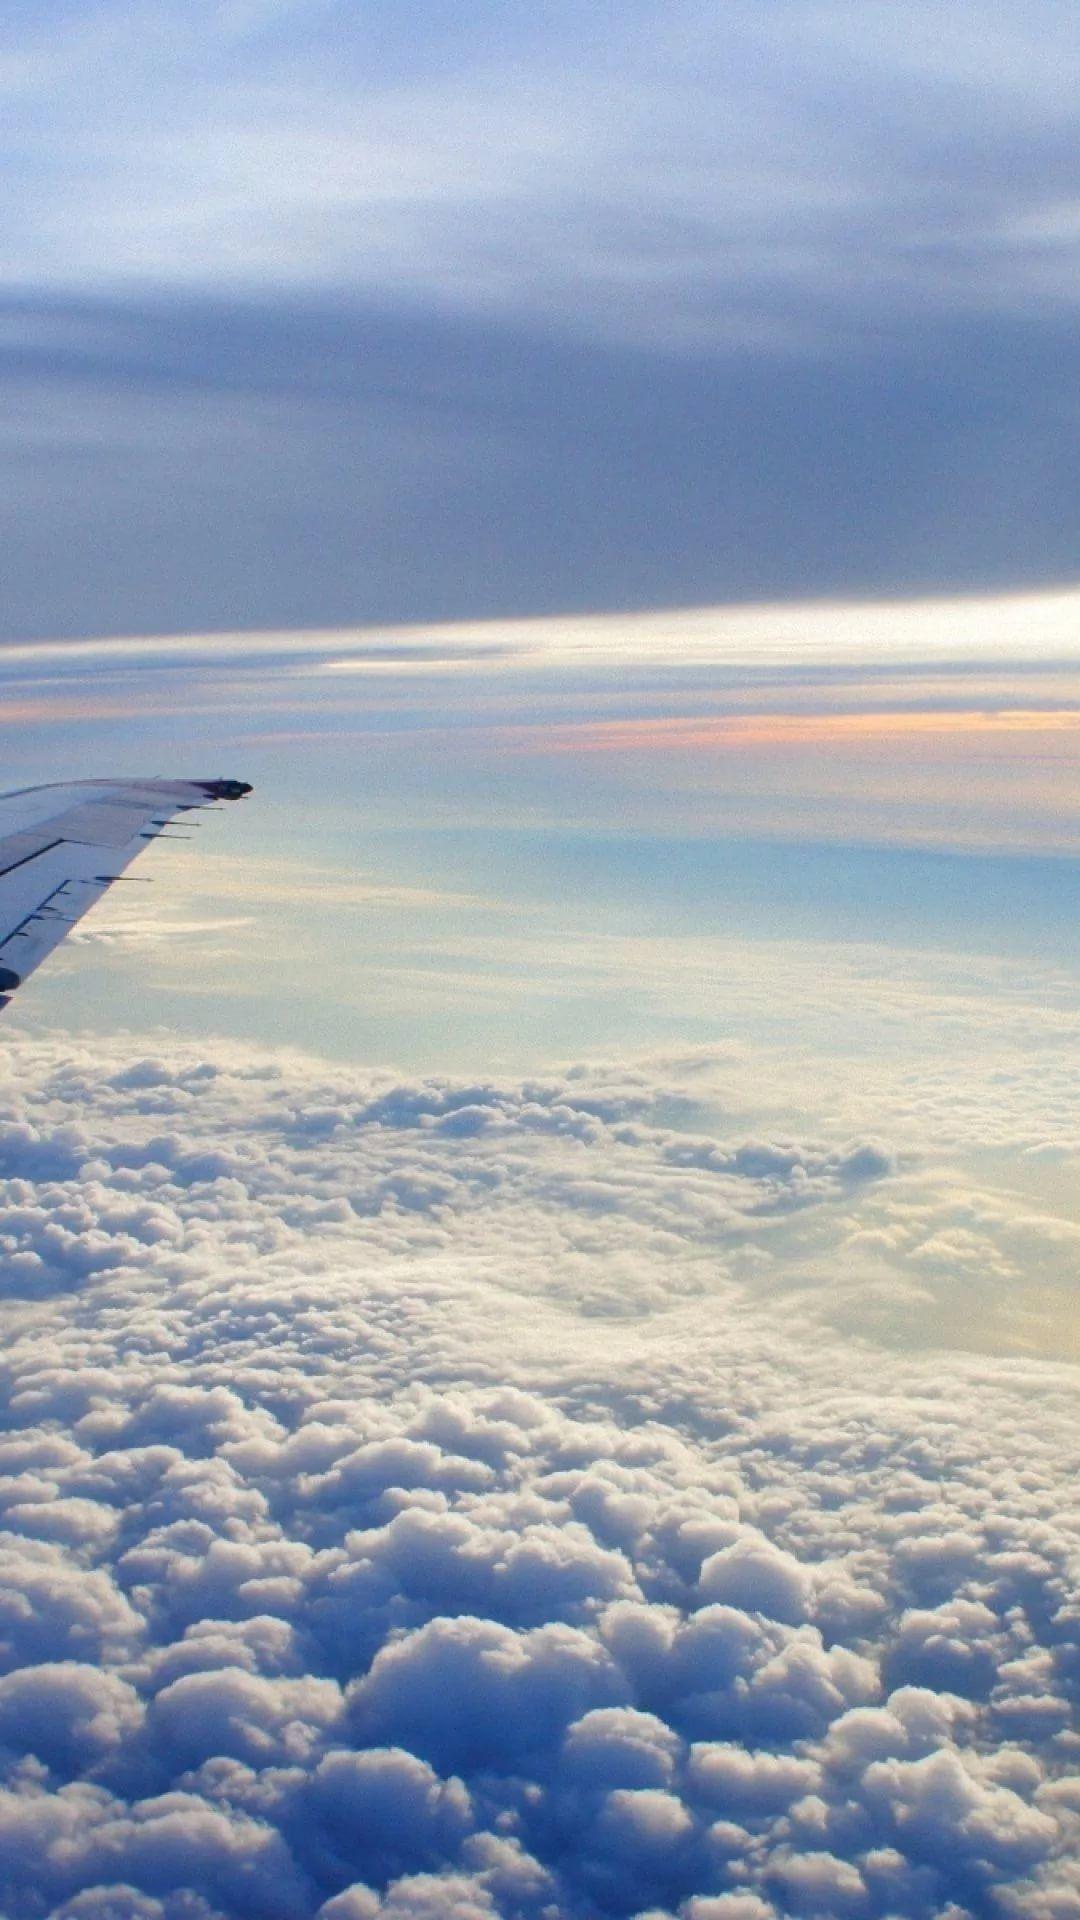 Airplane iPhone x wallpaper